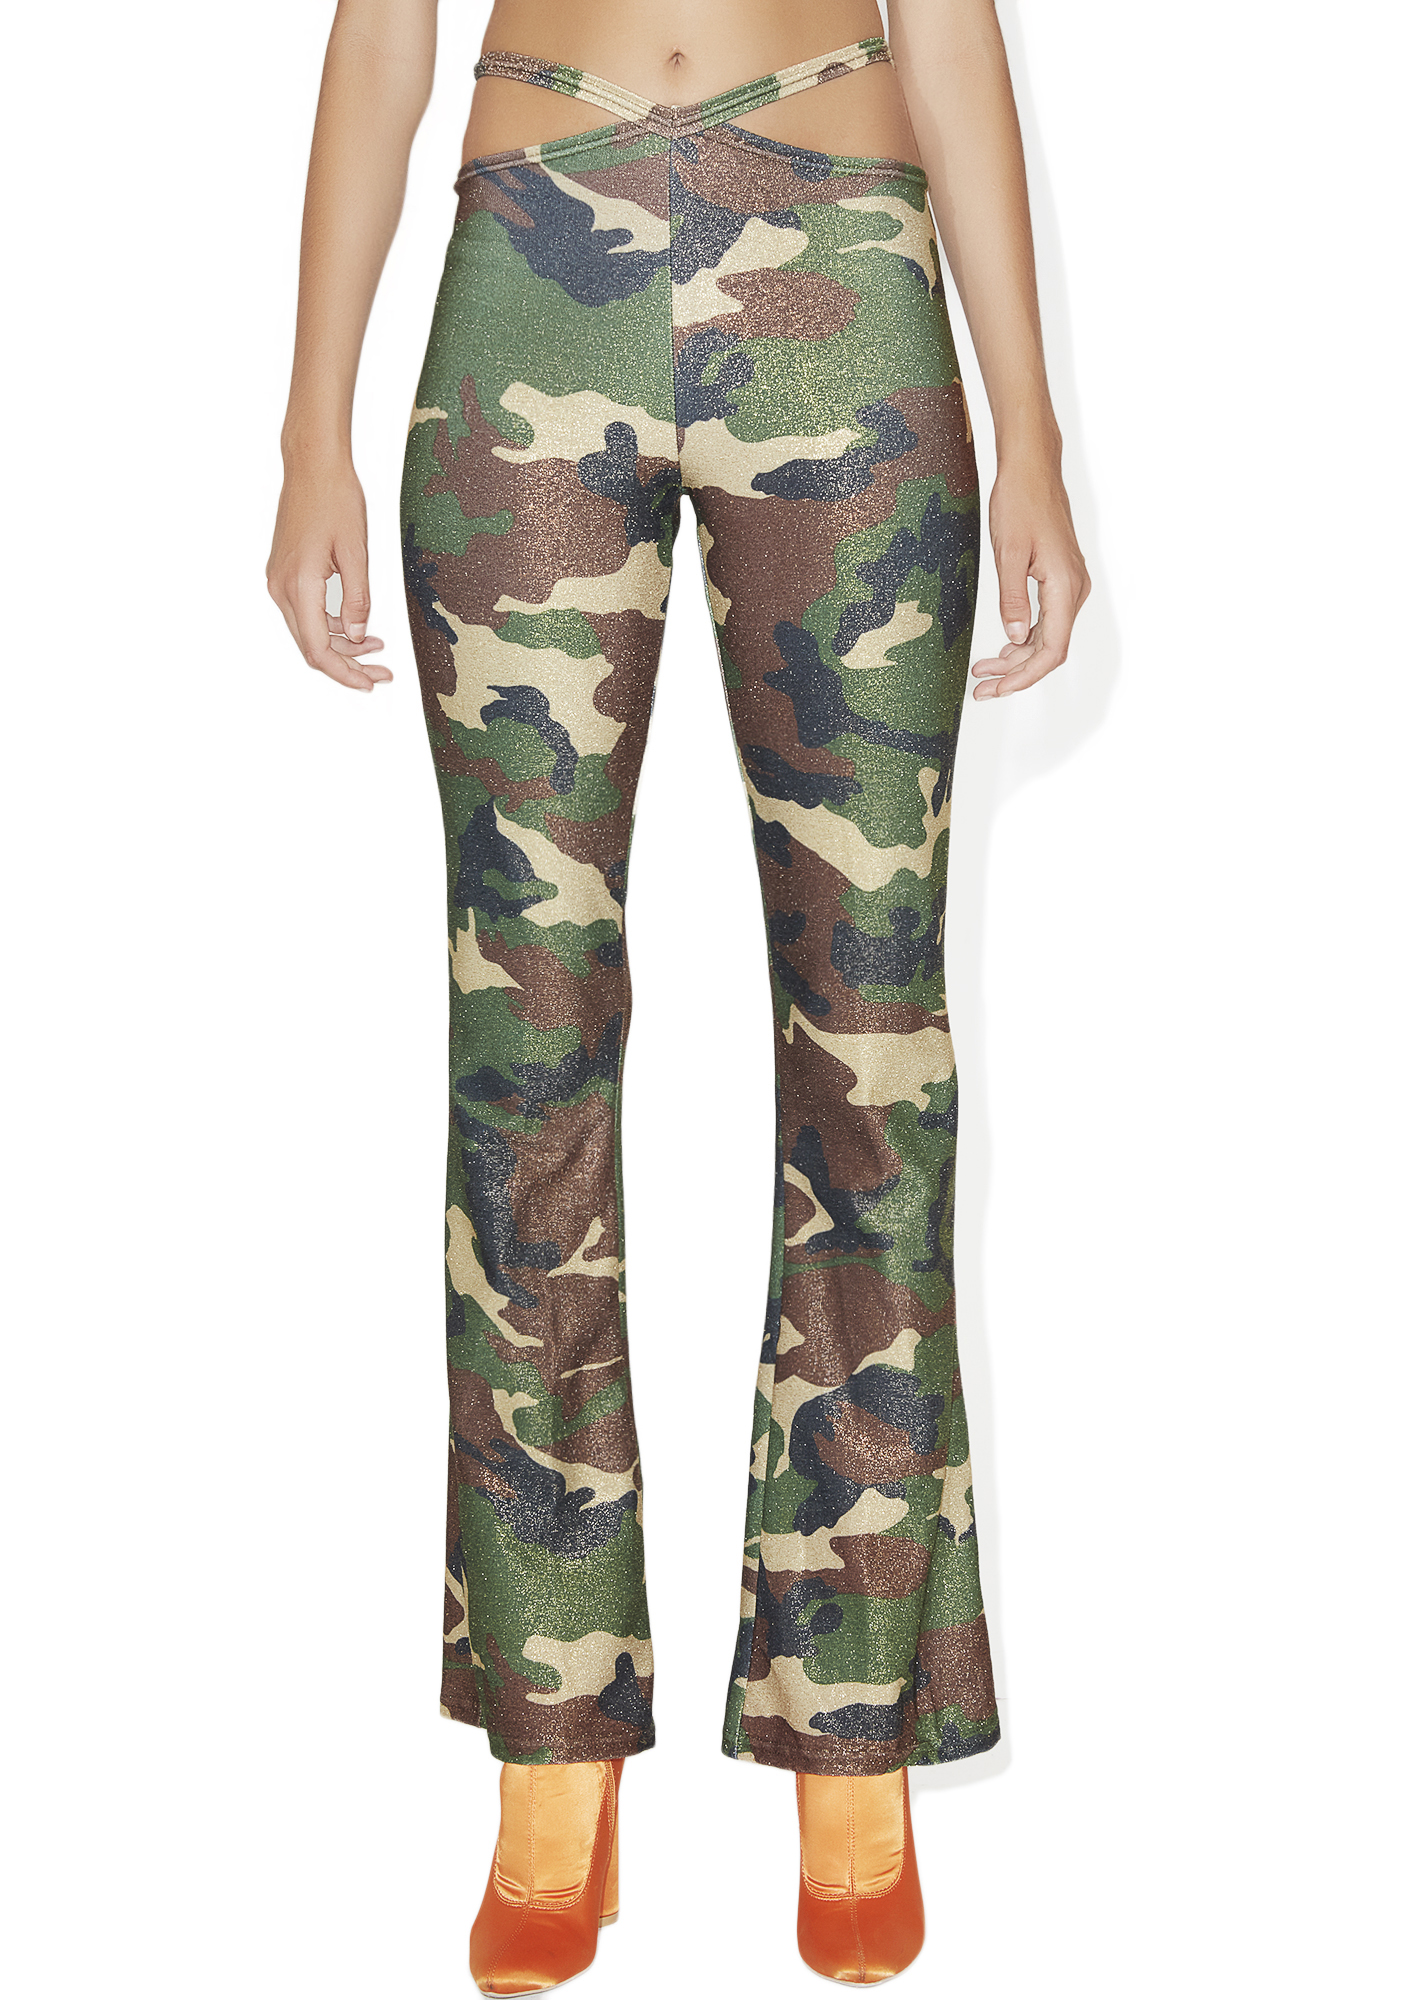 Glitter Bootcut Pants Green Camouflage